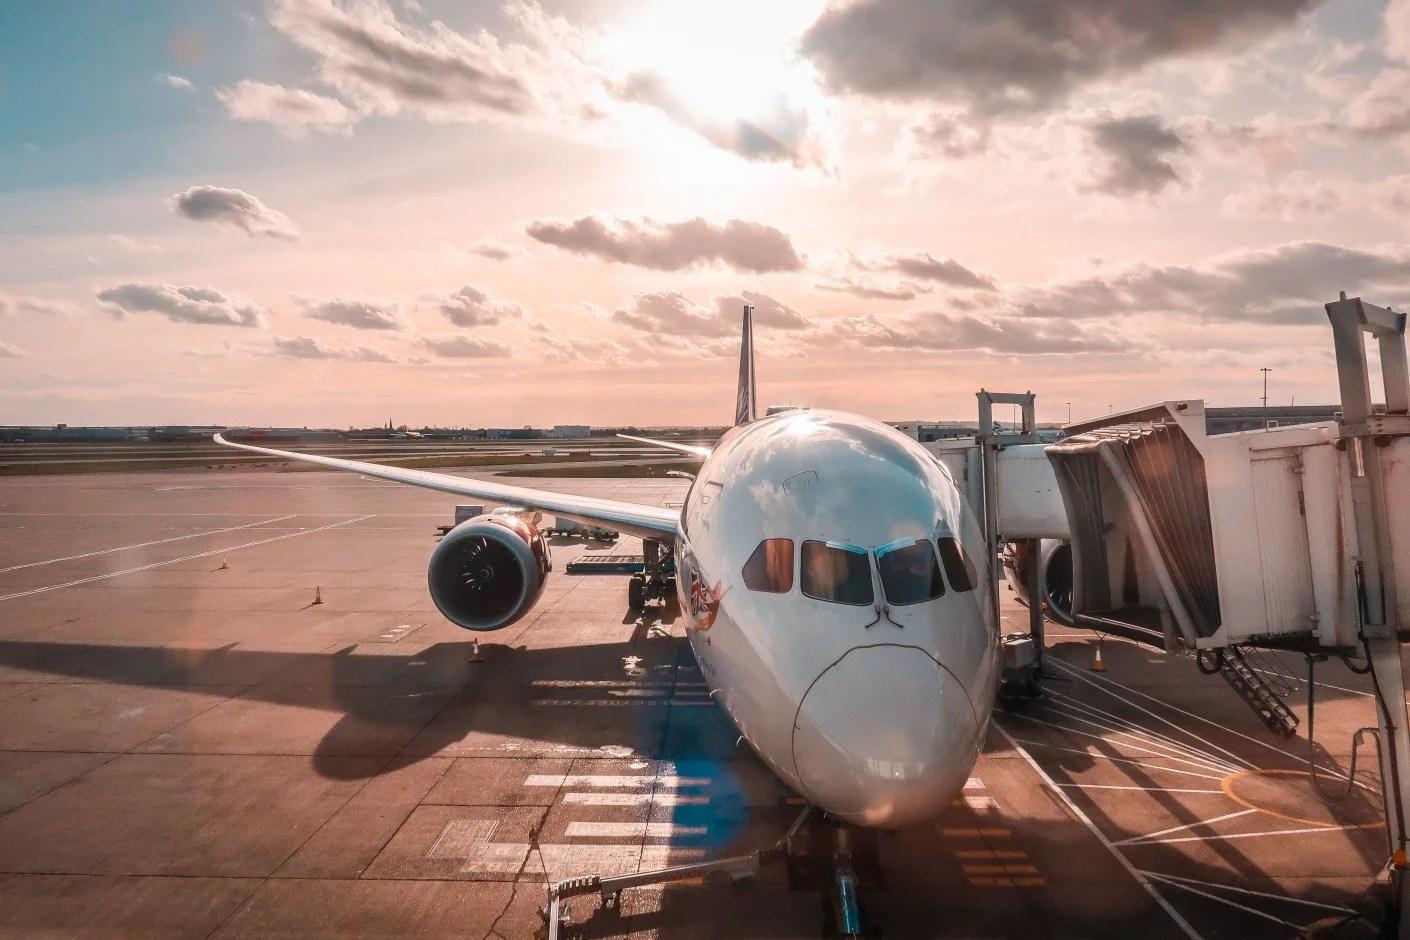 Review: Virgin Atlantic 787-9 Upper Class LHR-JFK